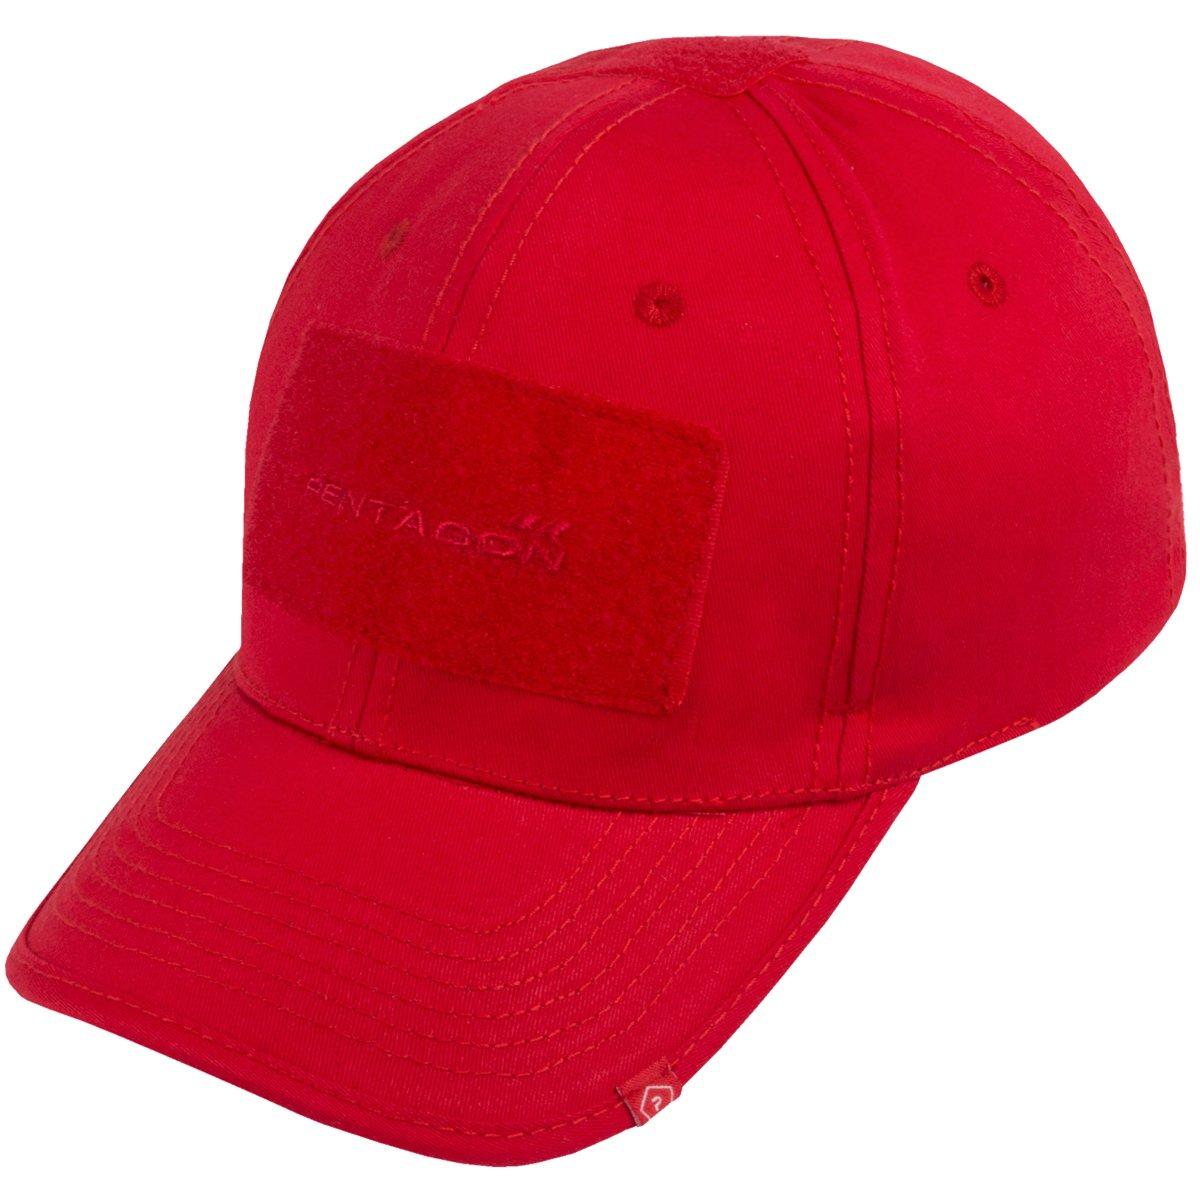 Pentagon Tactical 2.0 BB Cap Twill Red at Amazon Men s Clothing store  107c16f1c9ad